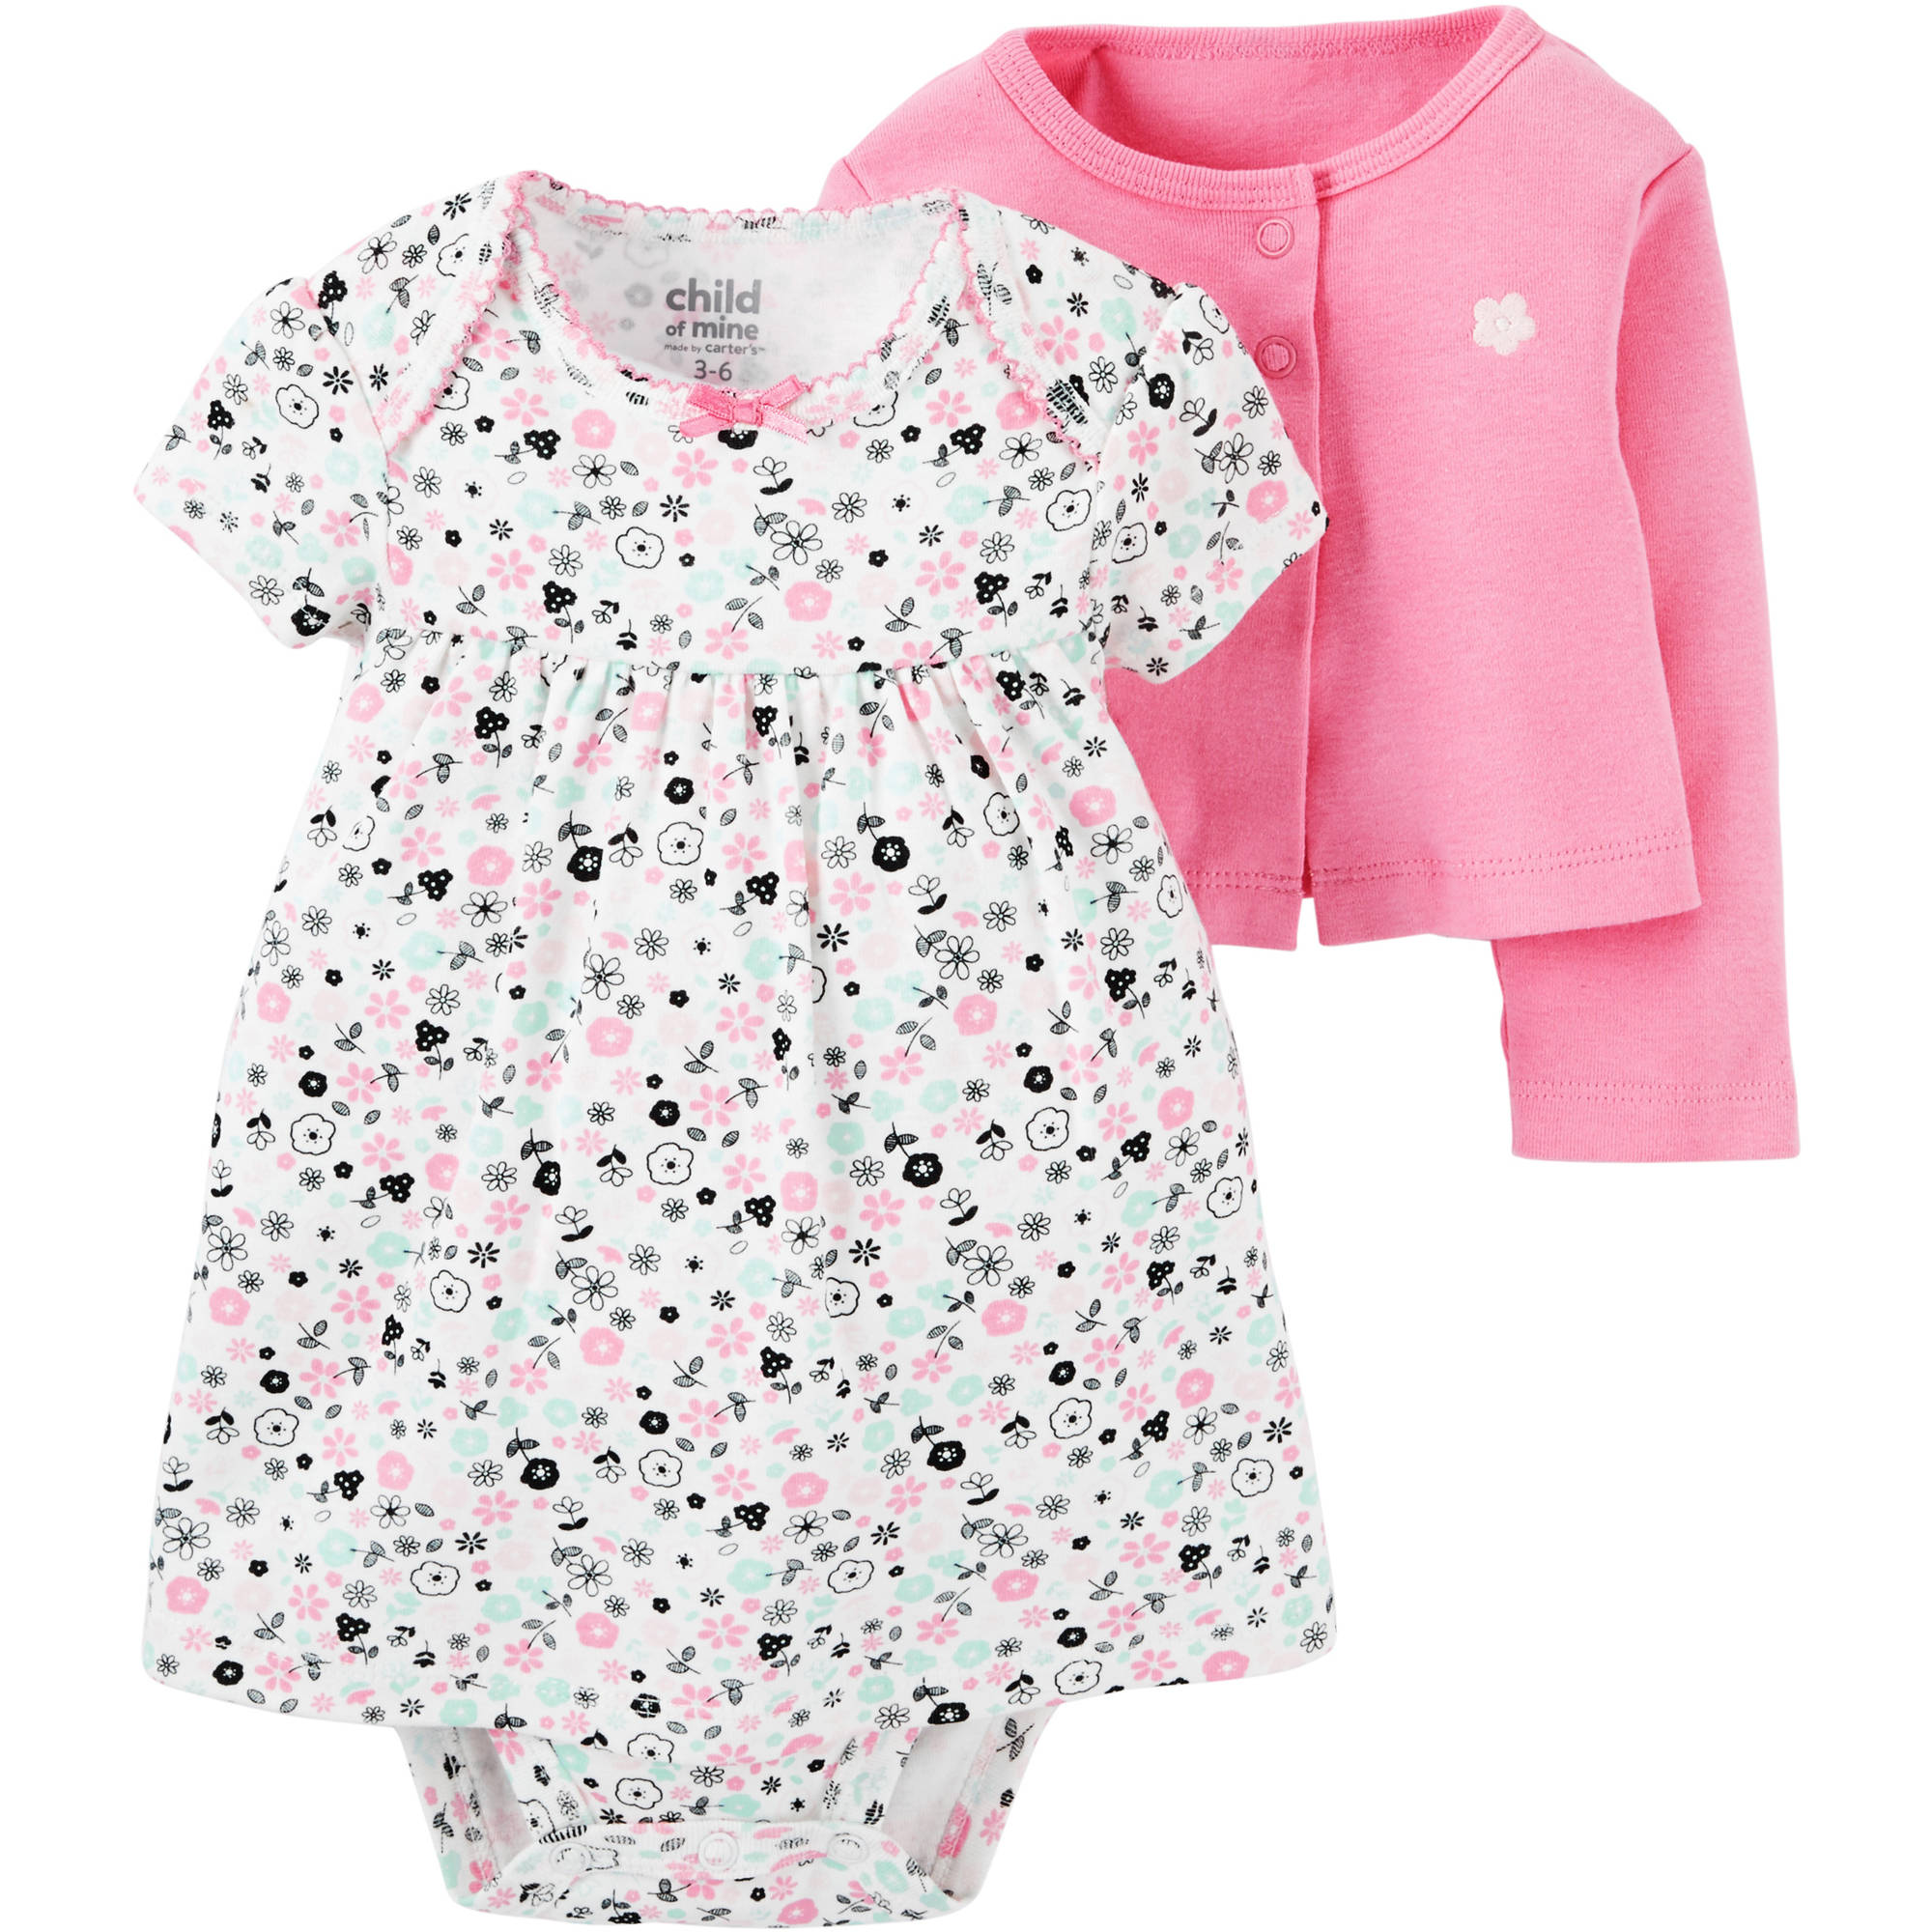 Child Mine Girl Dress Set Walmart